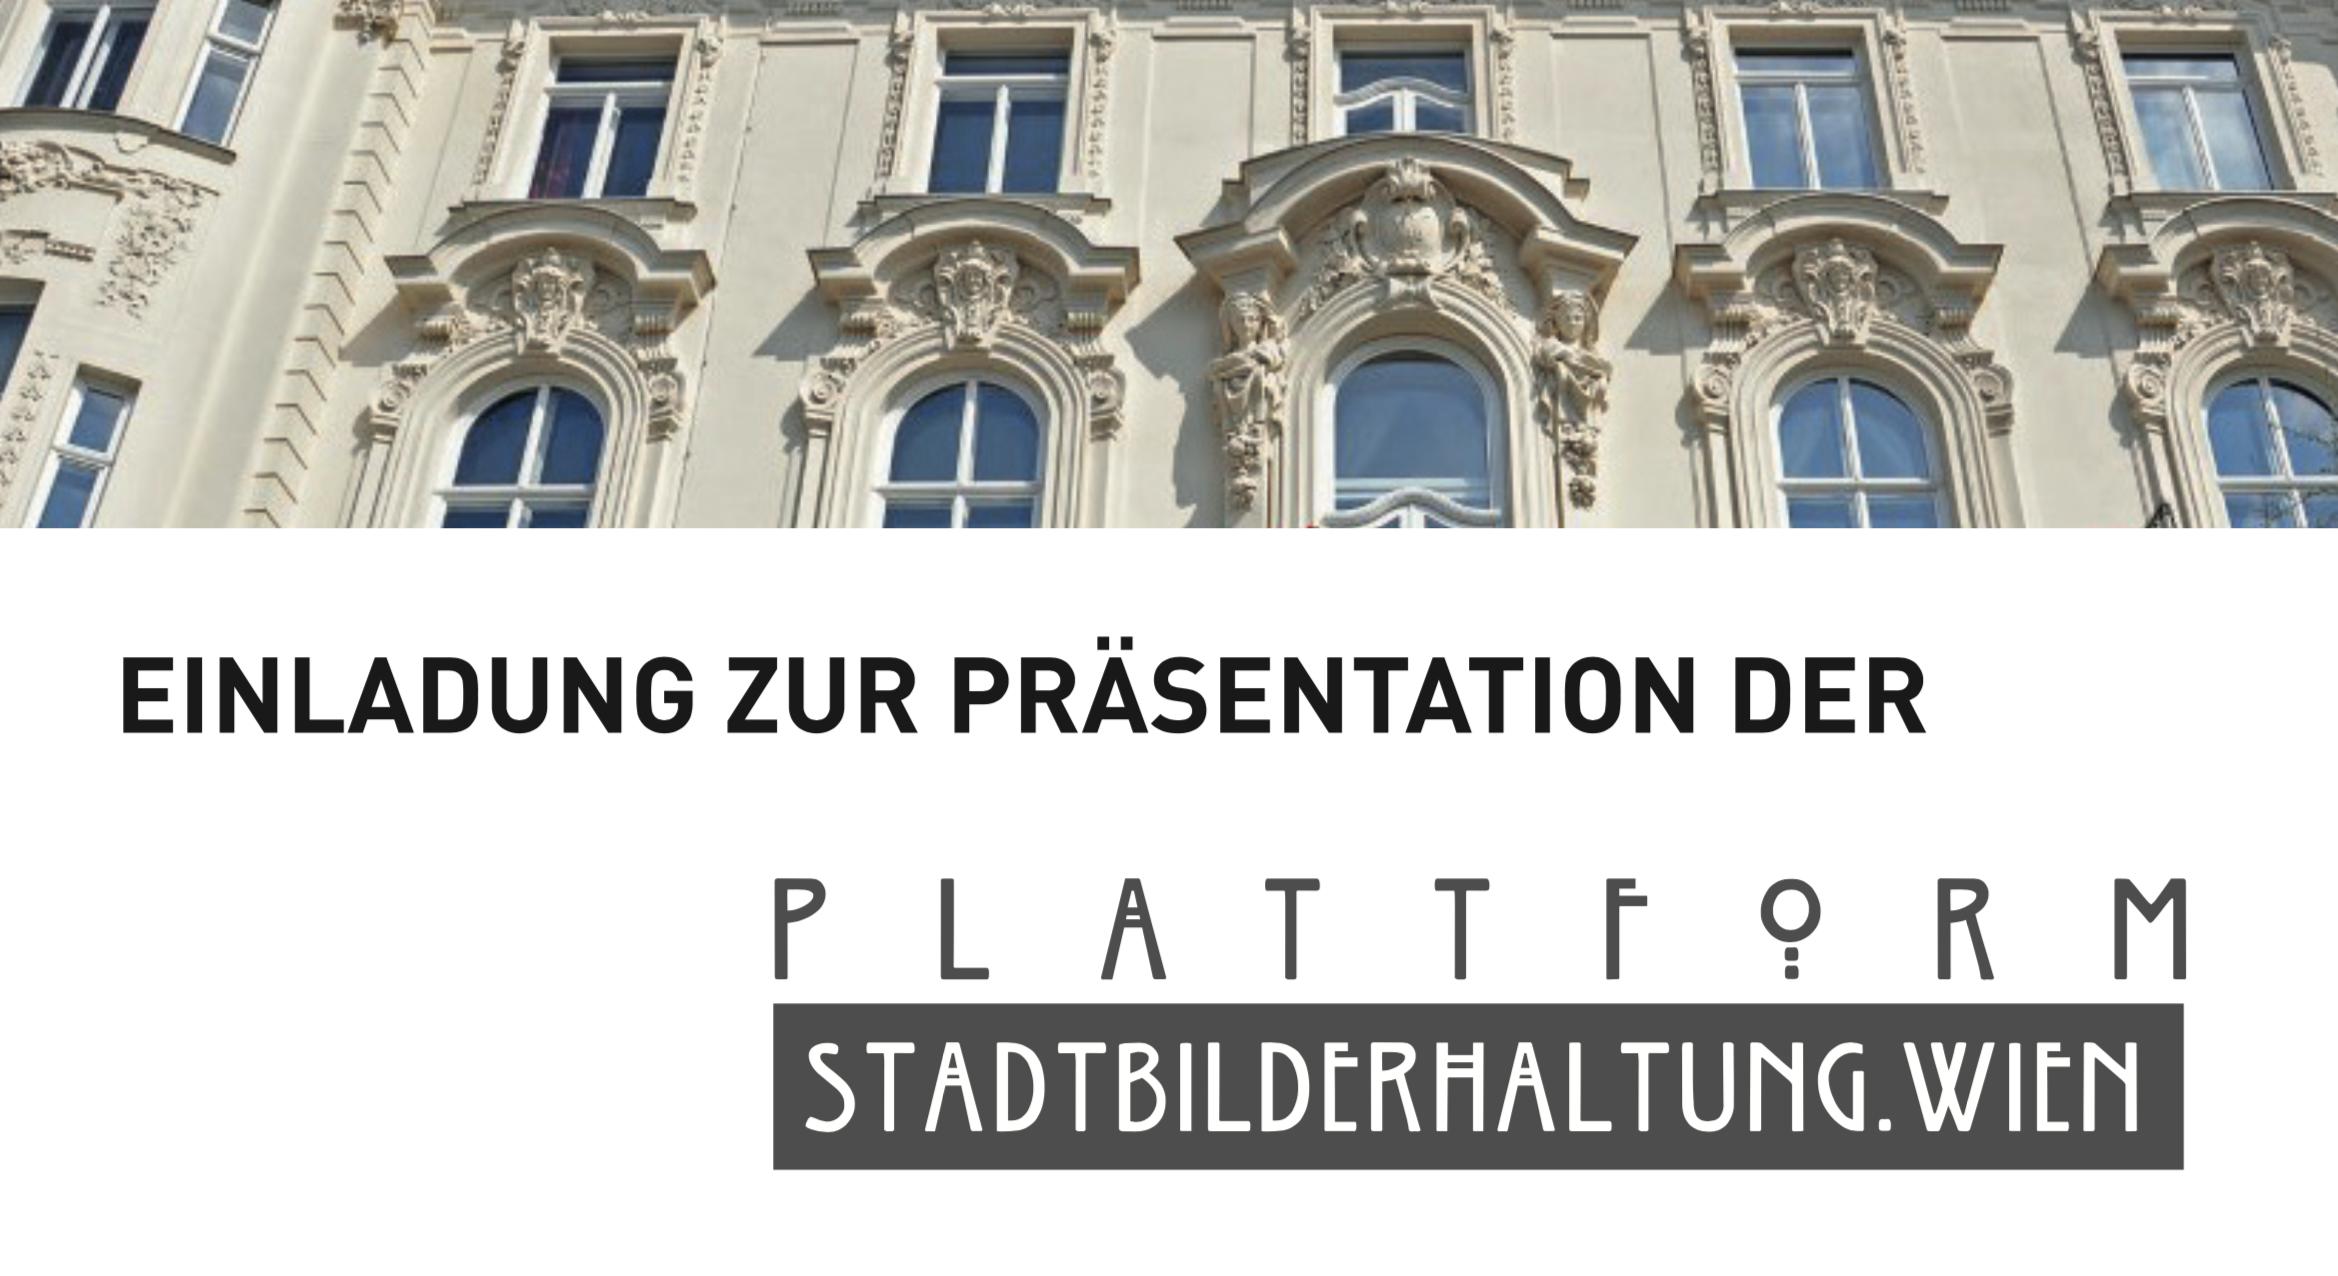 Plattform Stadtbilderhaltung.Wien